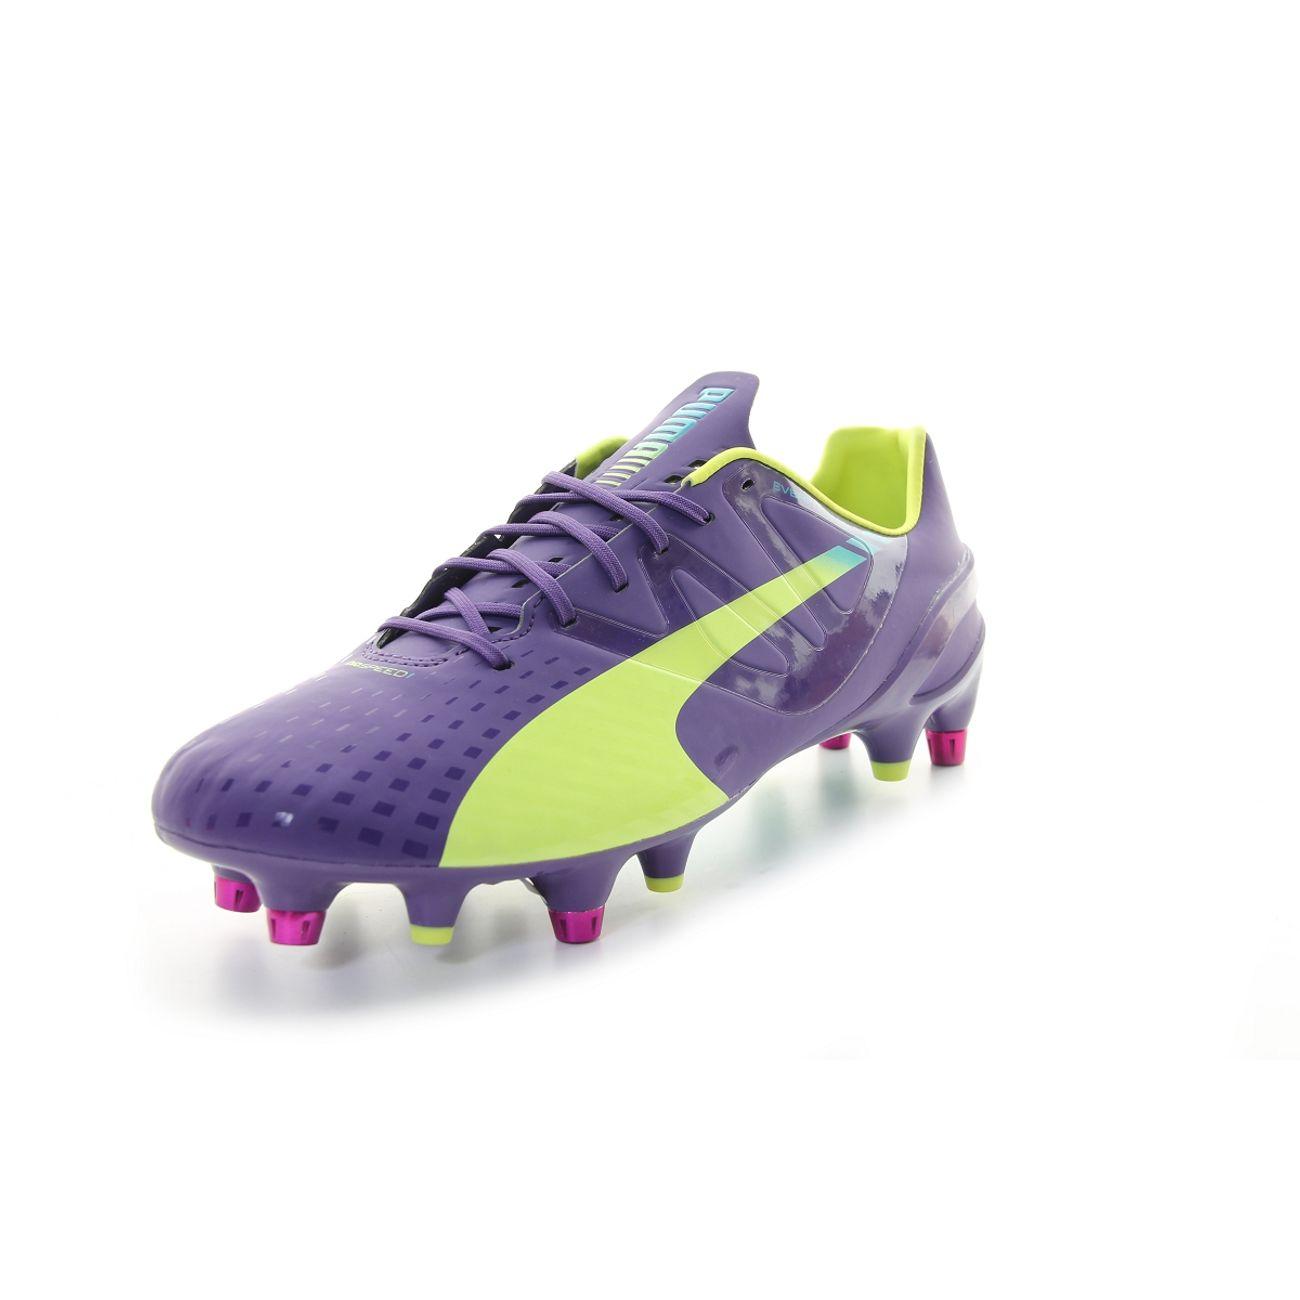 Achat Et Homme Football Puma Sg Prix Chaussures Mixed Evospeed 1 3 – L3ARjq54